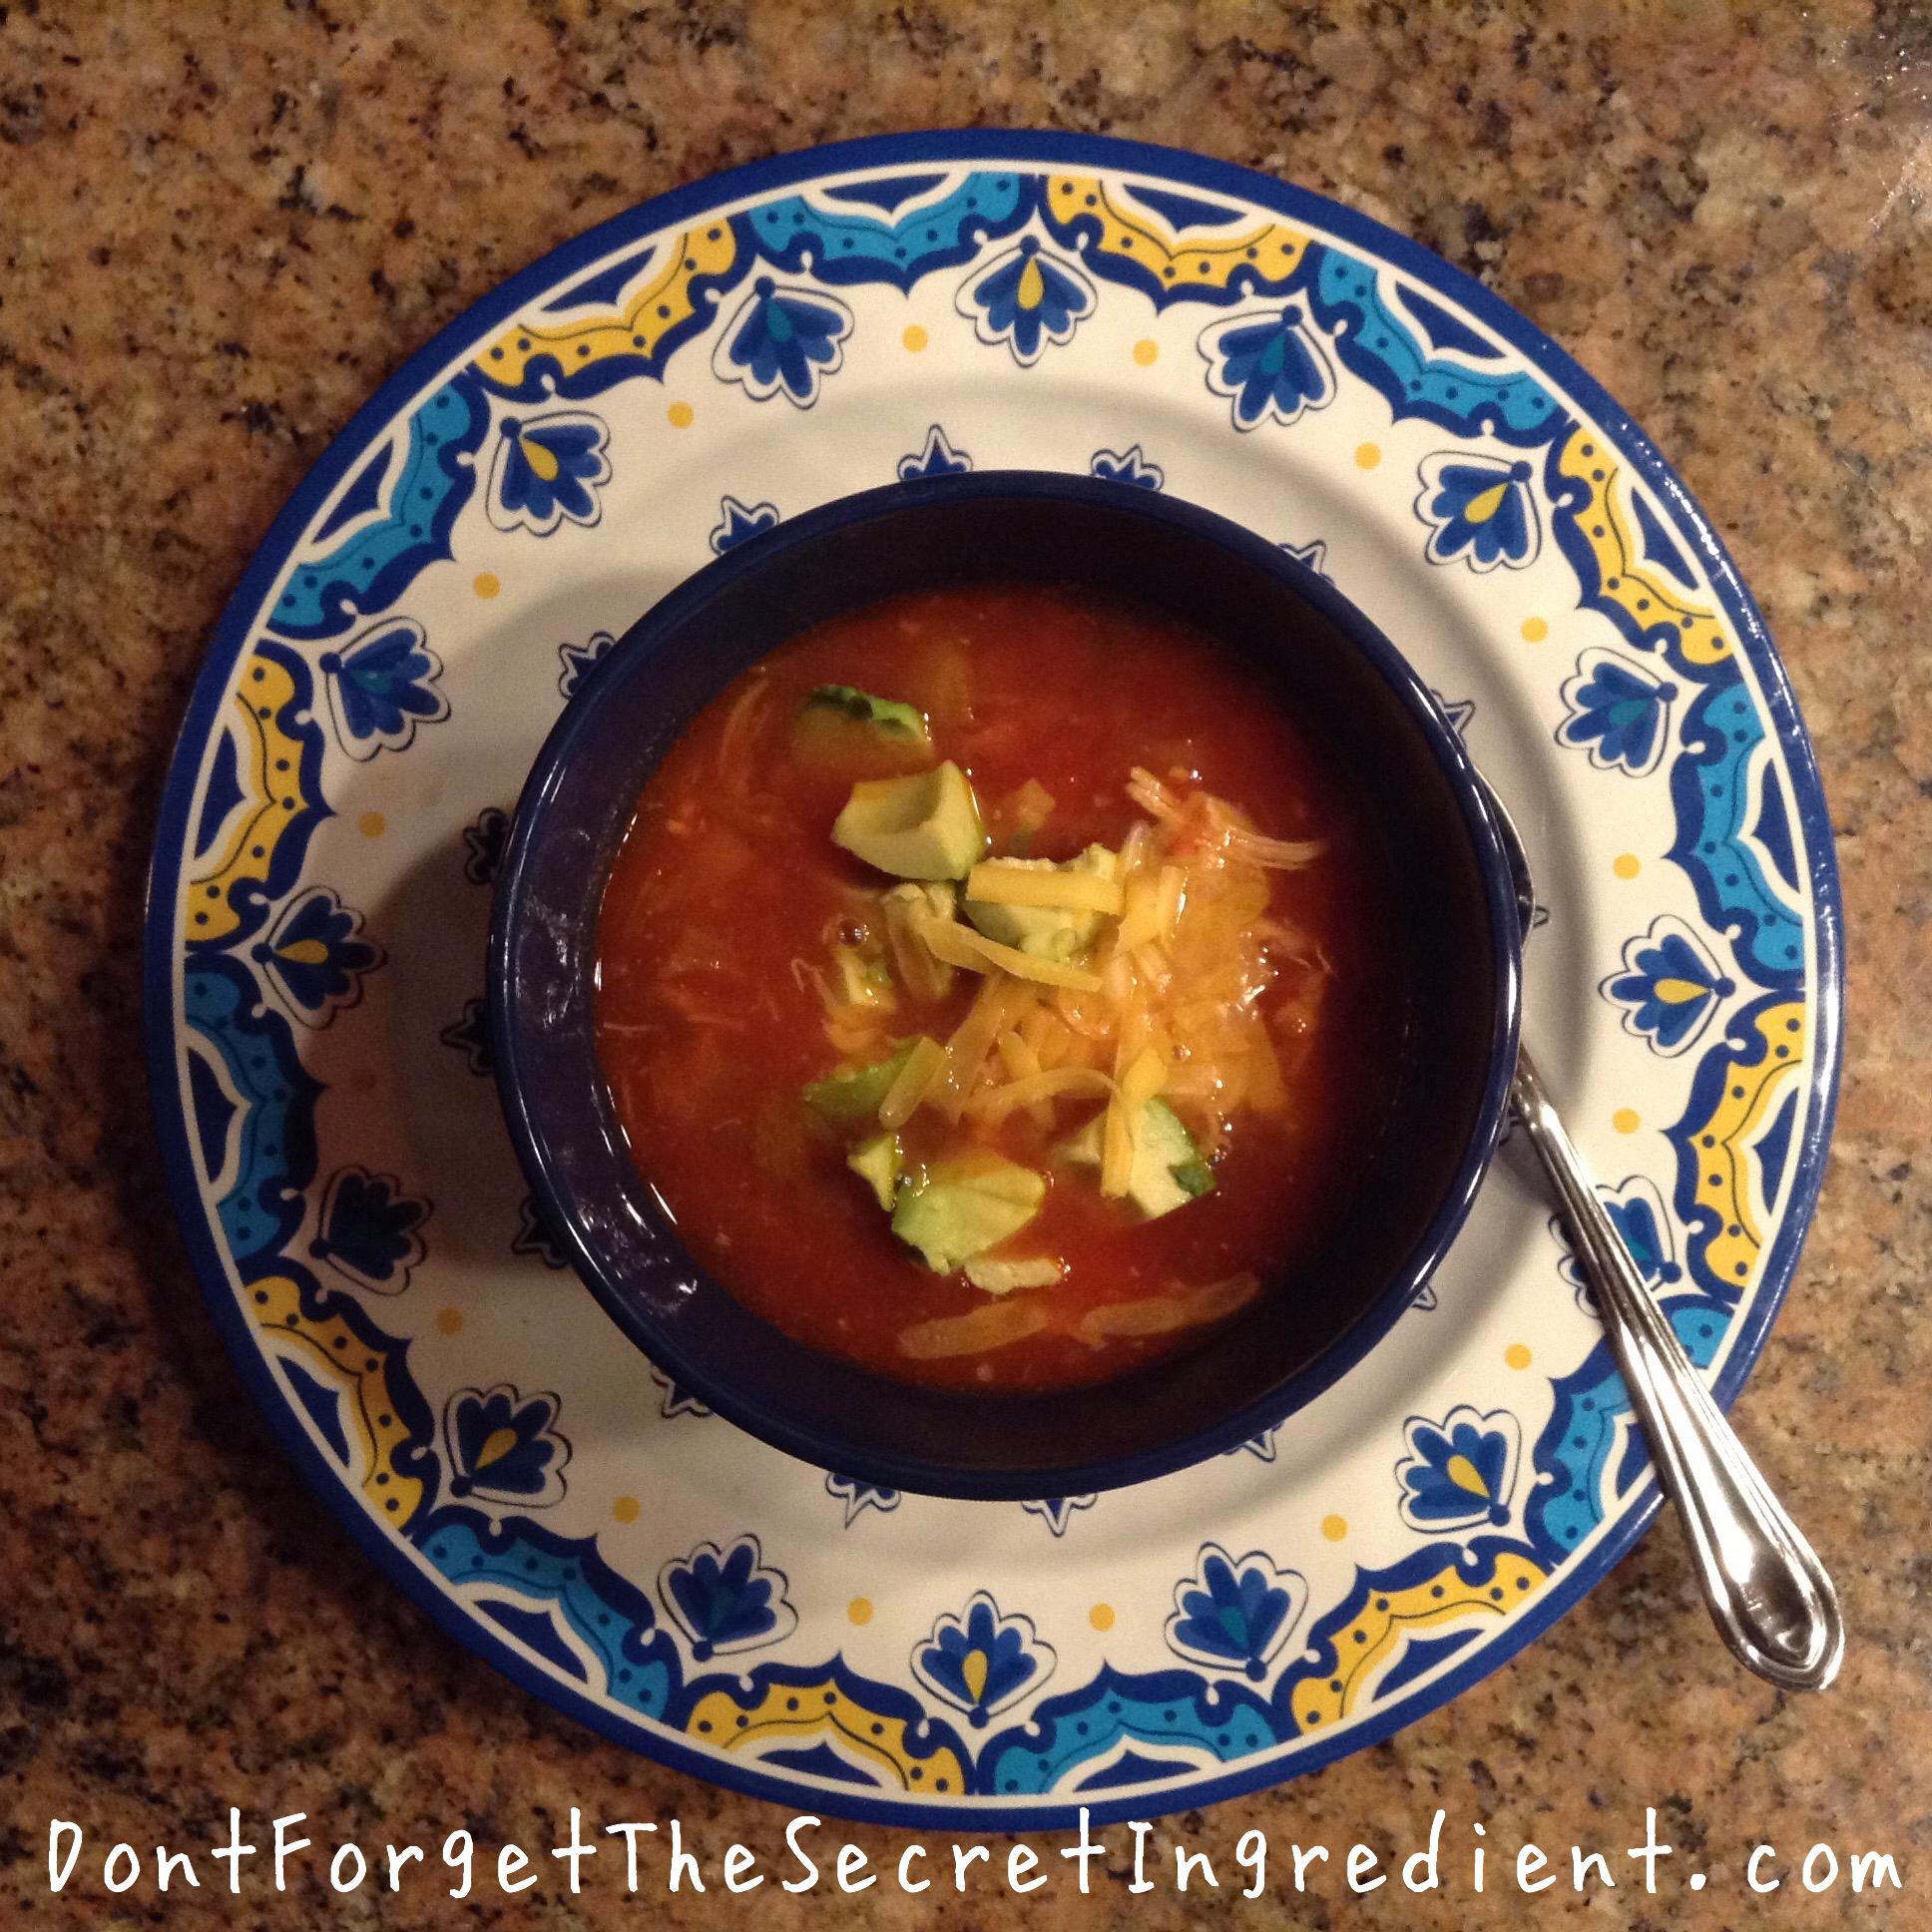 Ina's Chicken Tortilla Soup